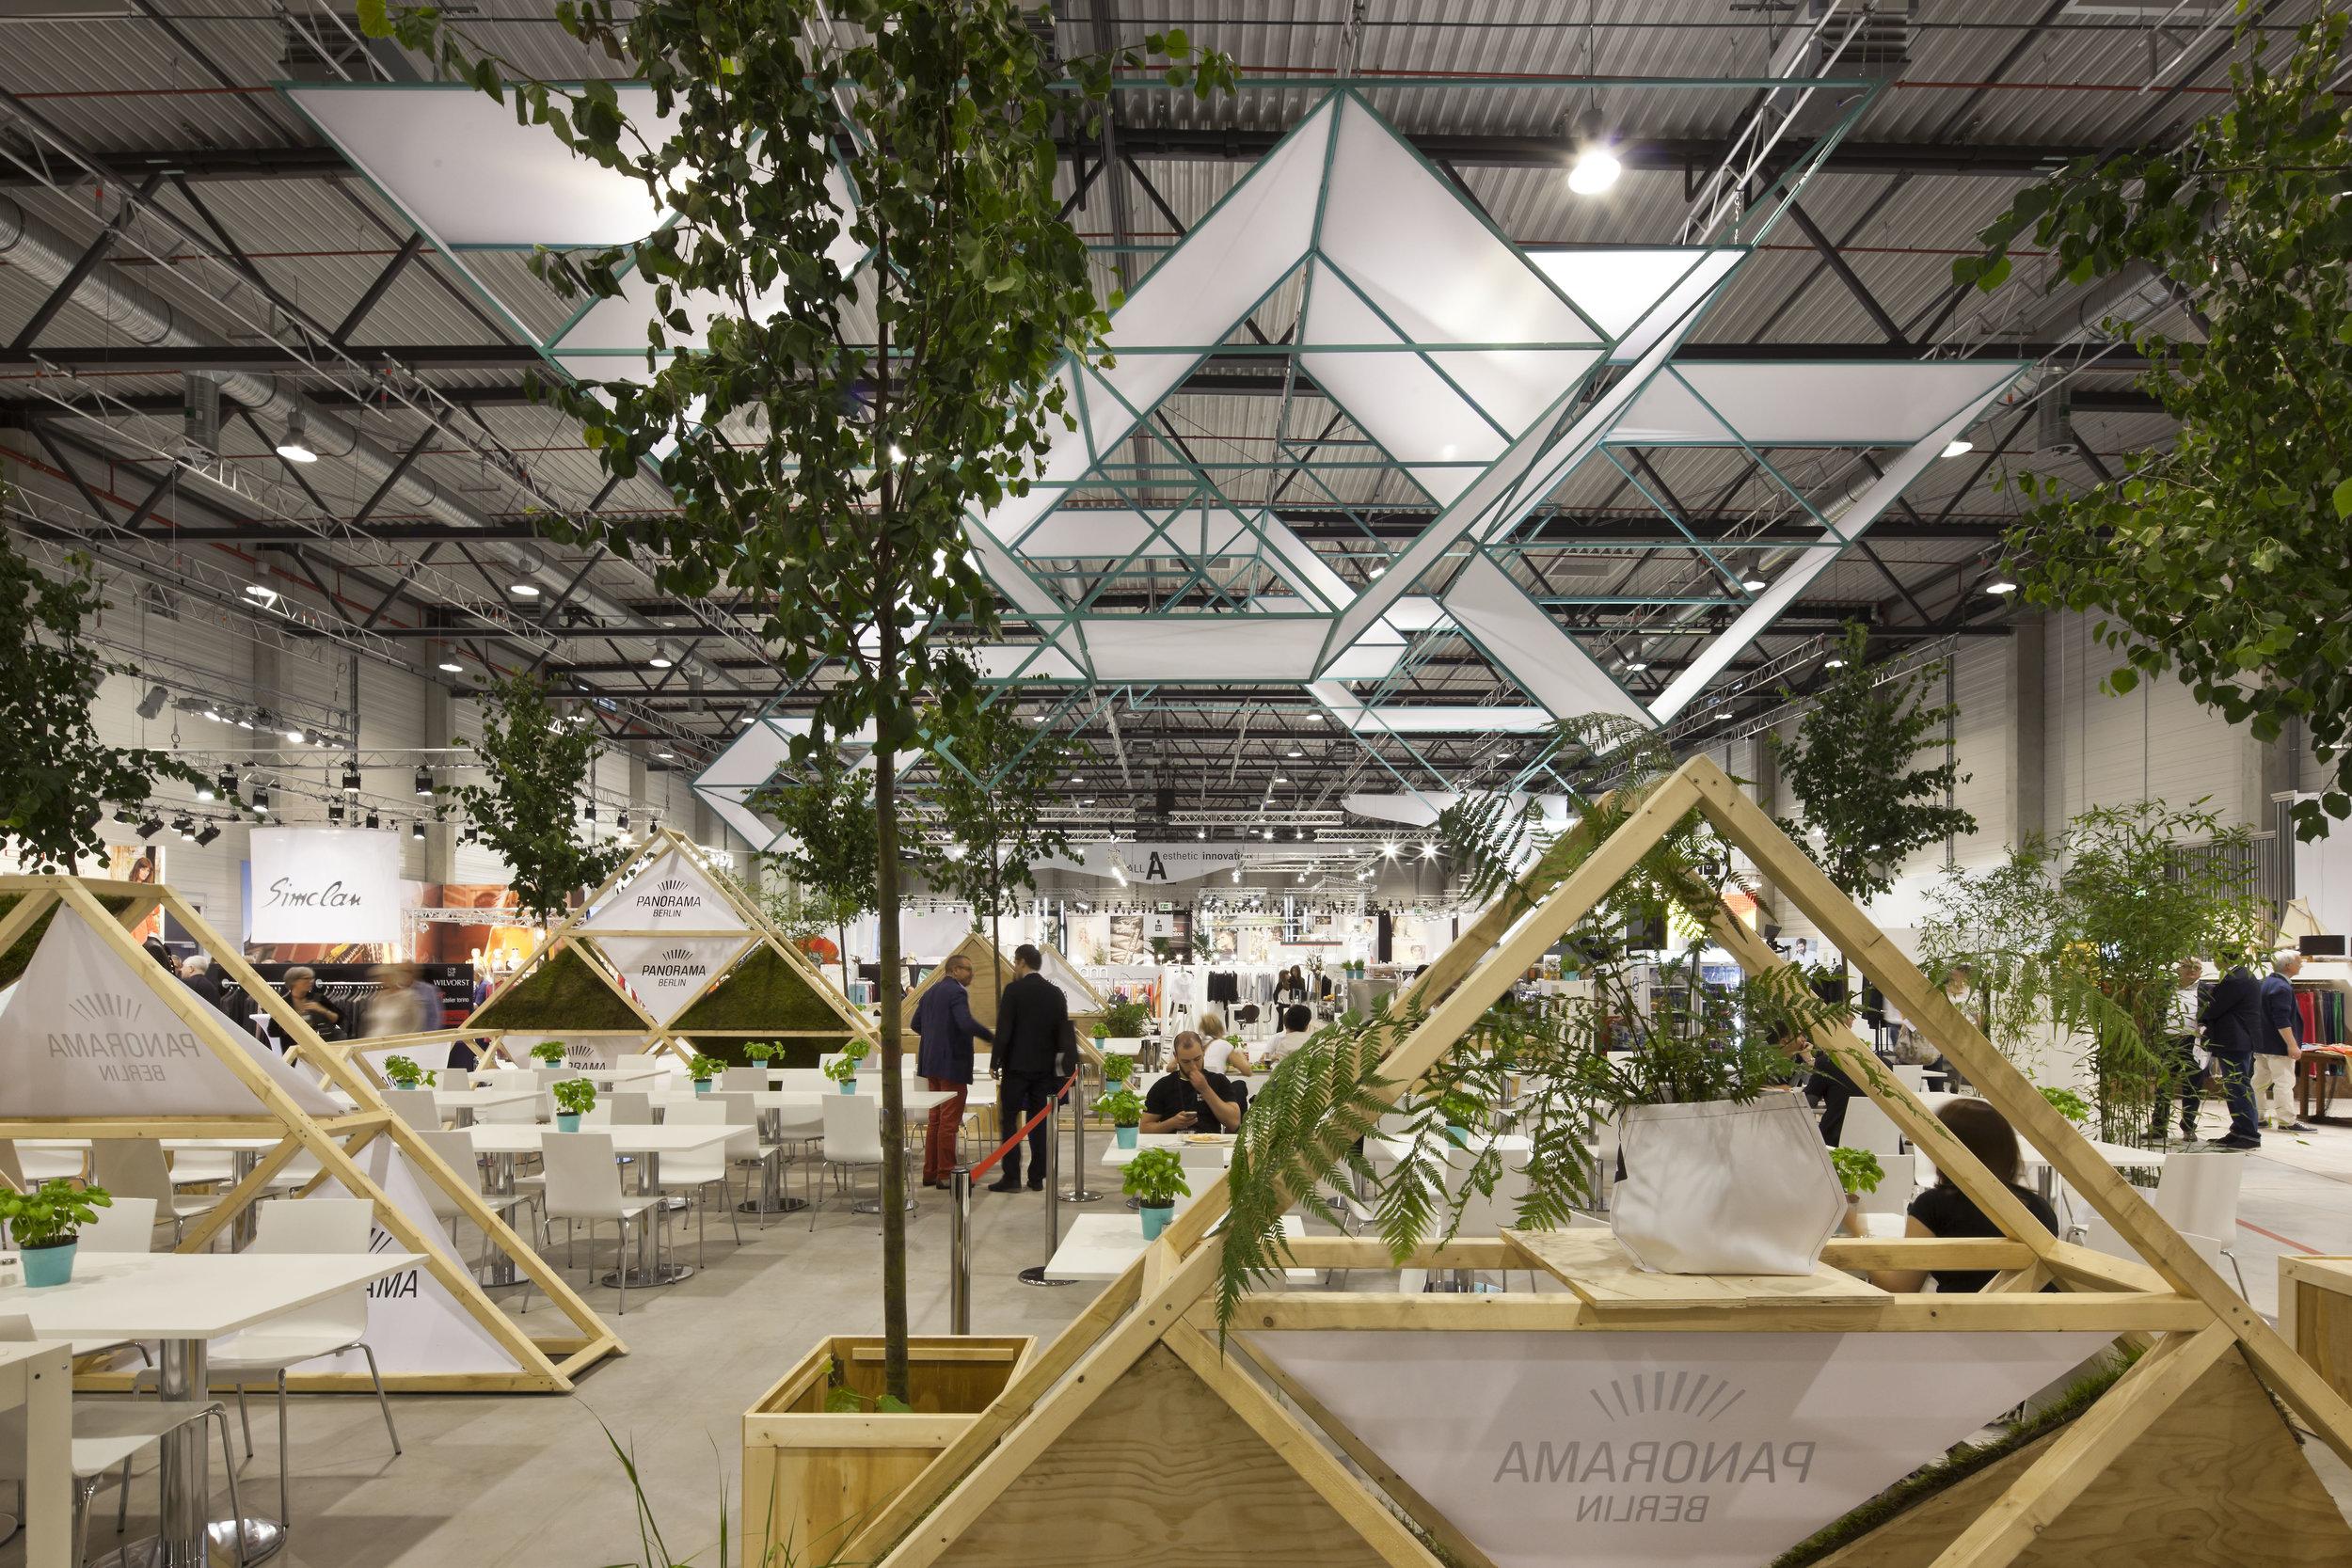 panorama_tradefair-exhibition-design_coordination-berlin_09.jpg